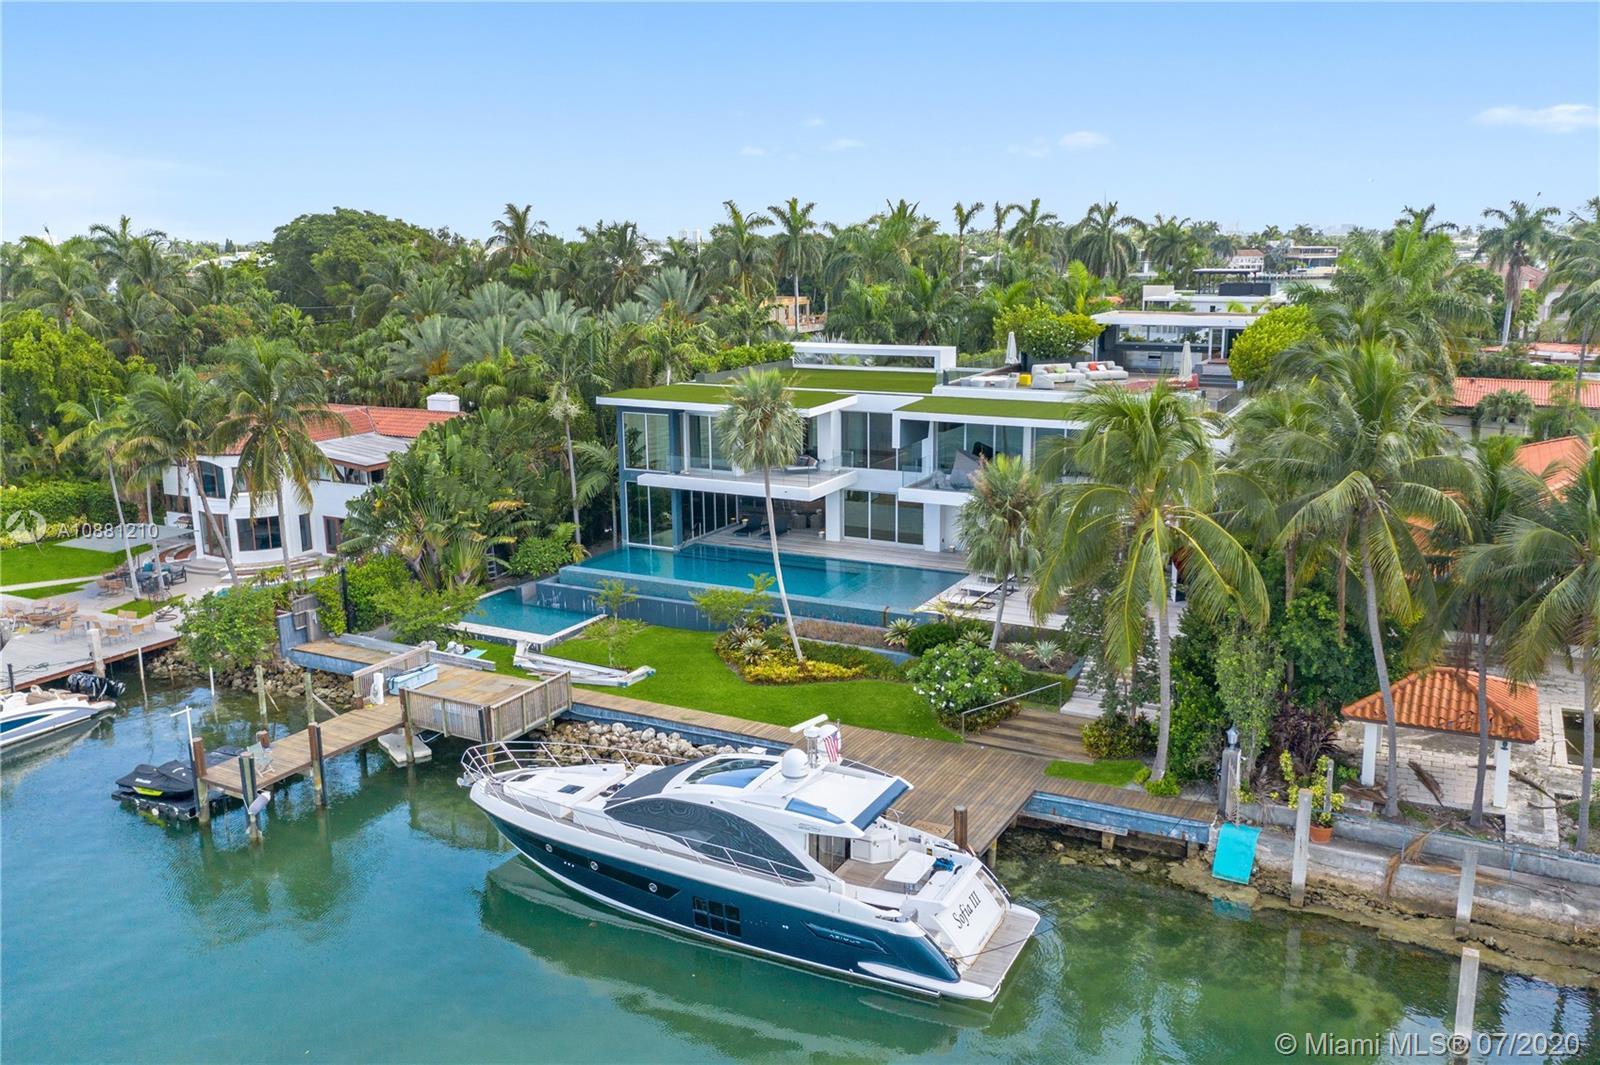 370 S Hibiscus Dr Luxury Real Estate